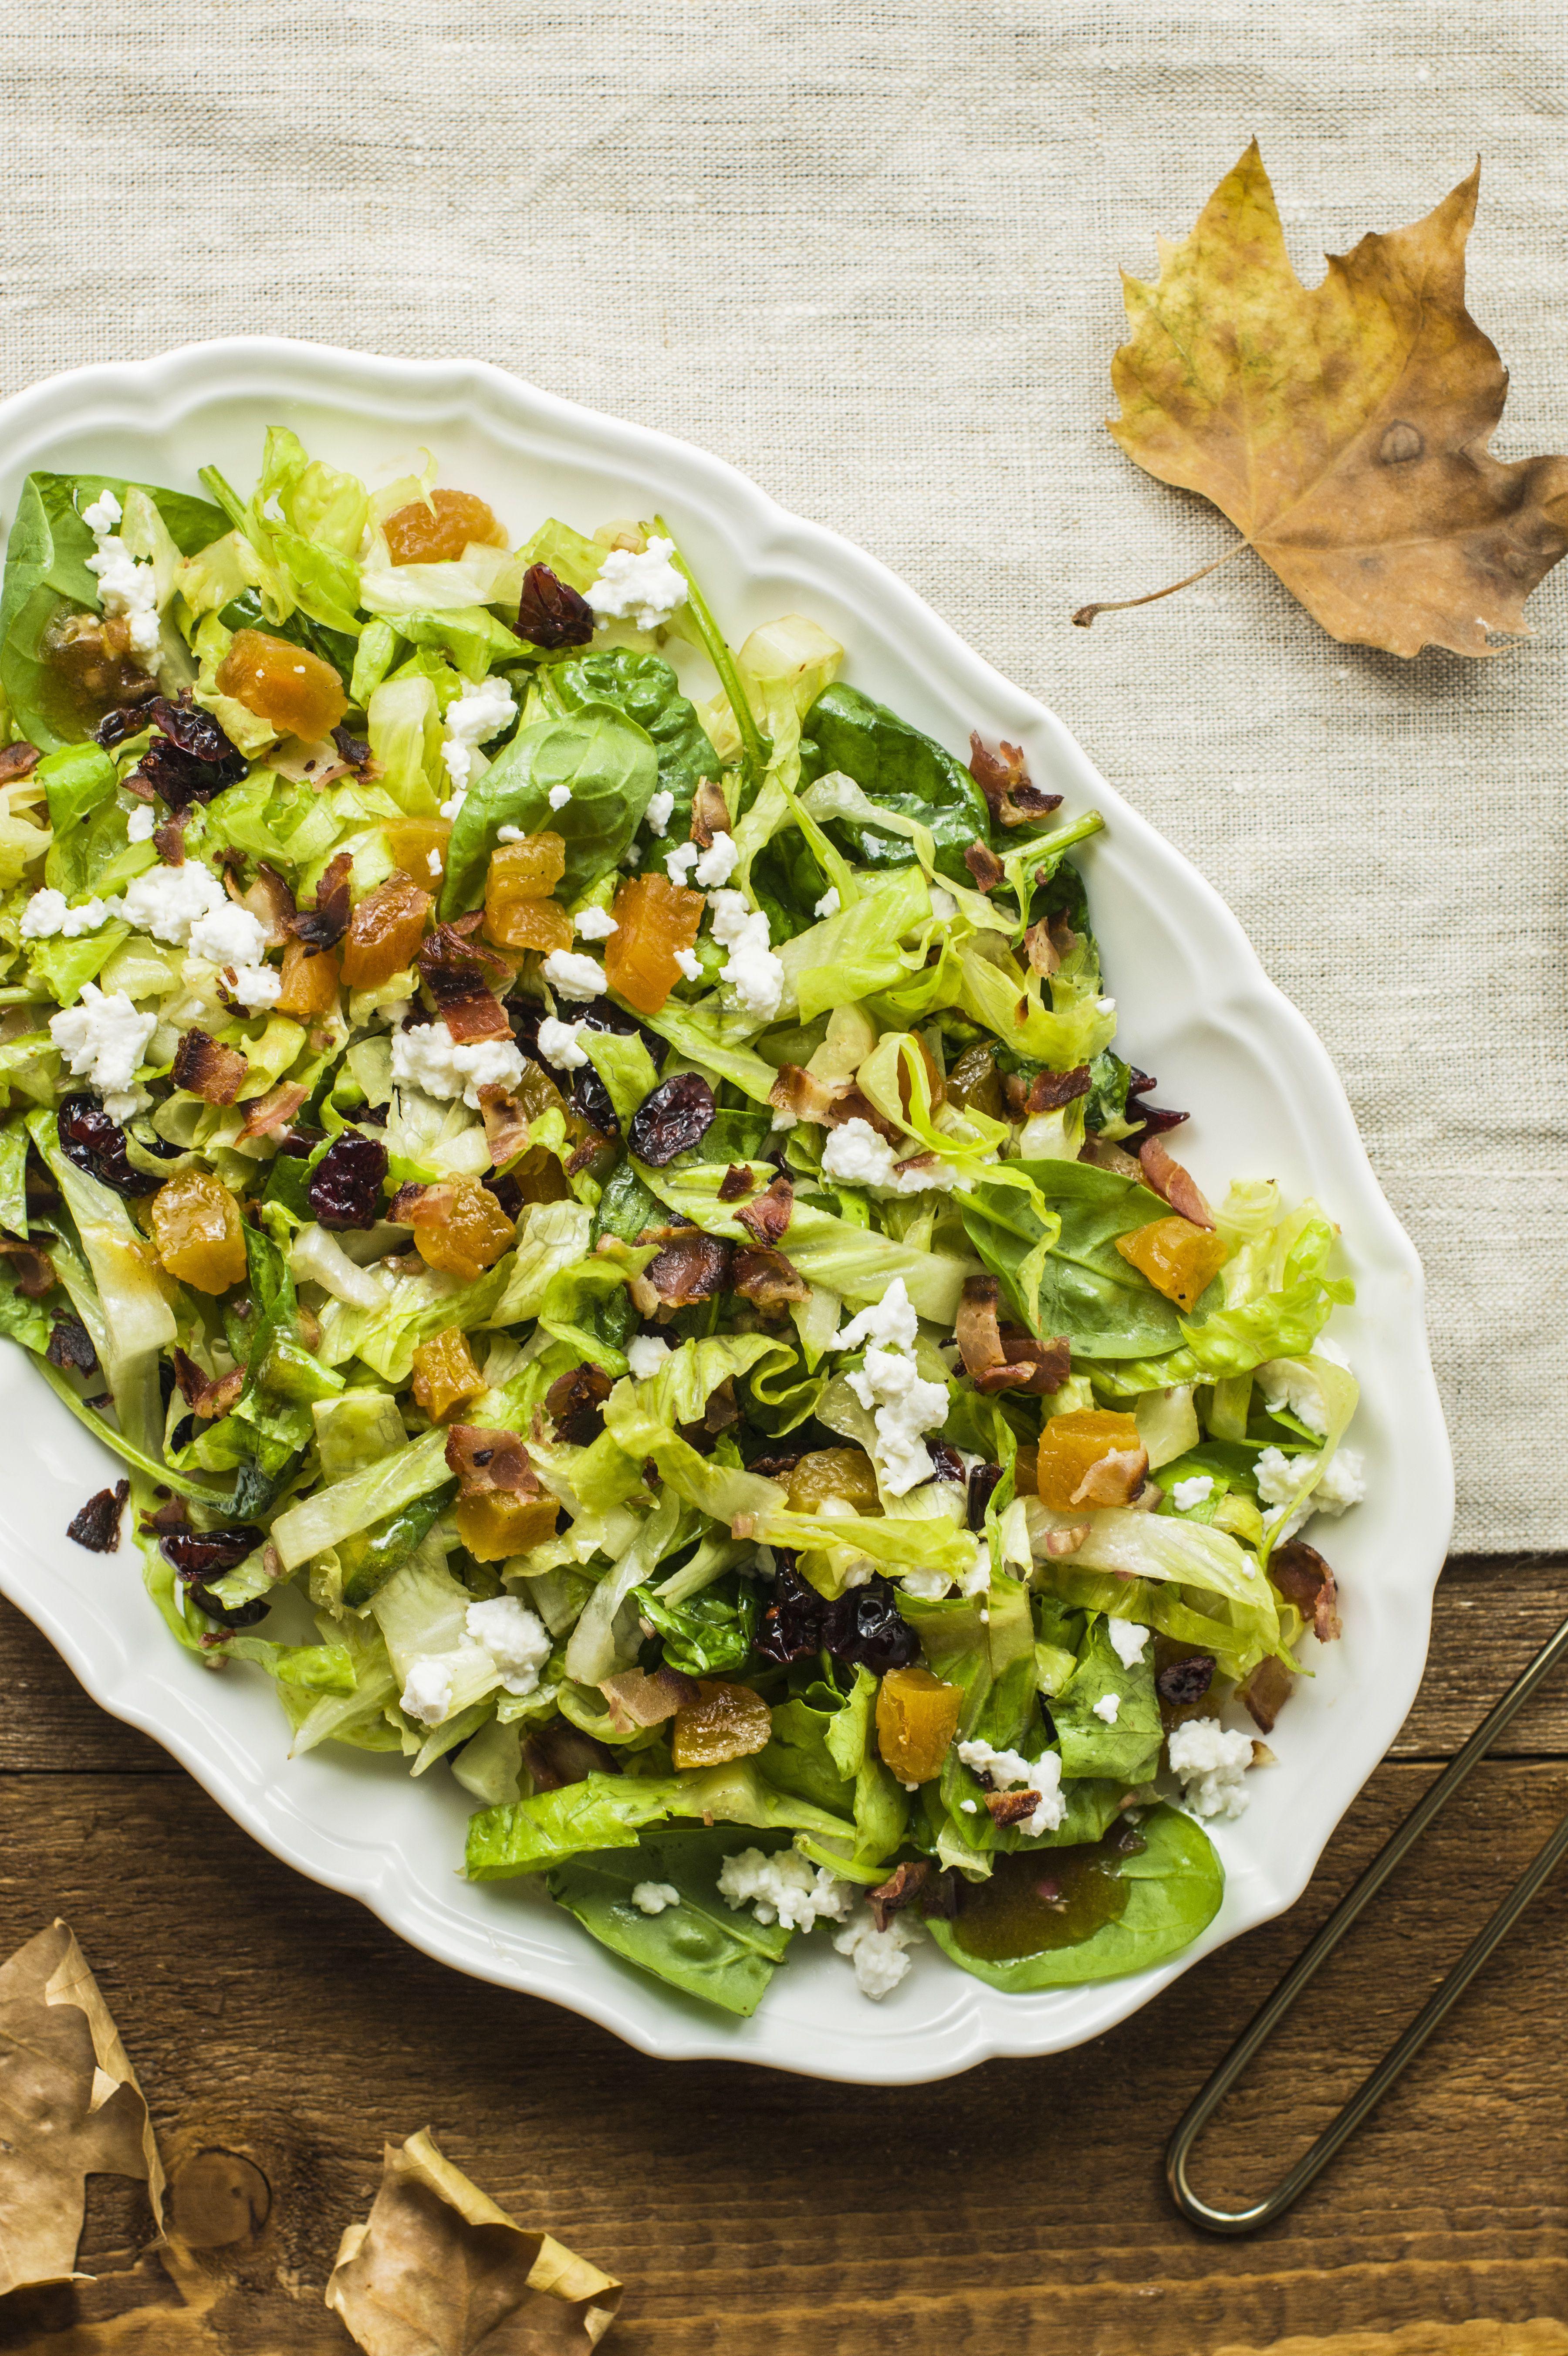 Colorful Autumn Salad